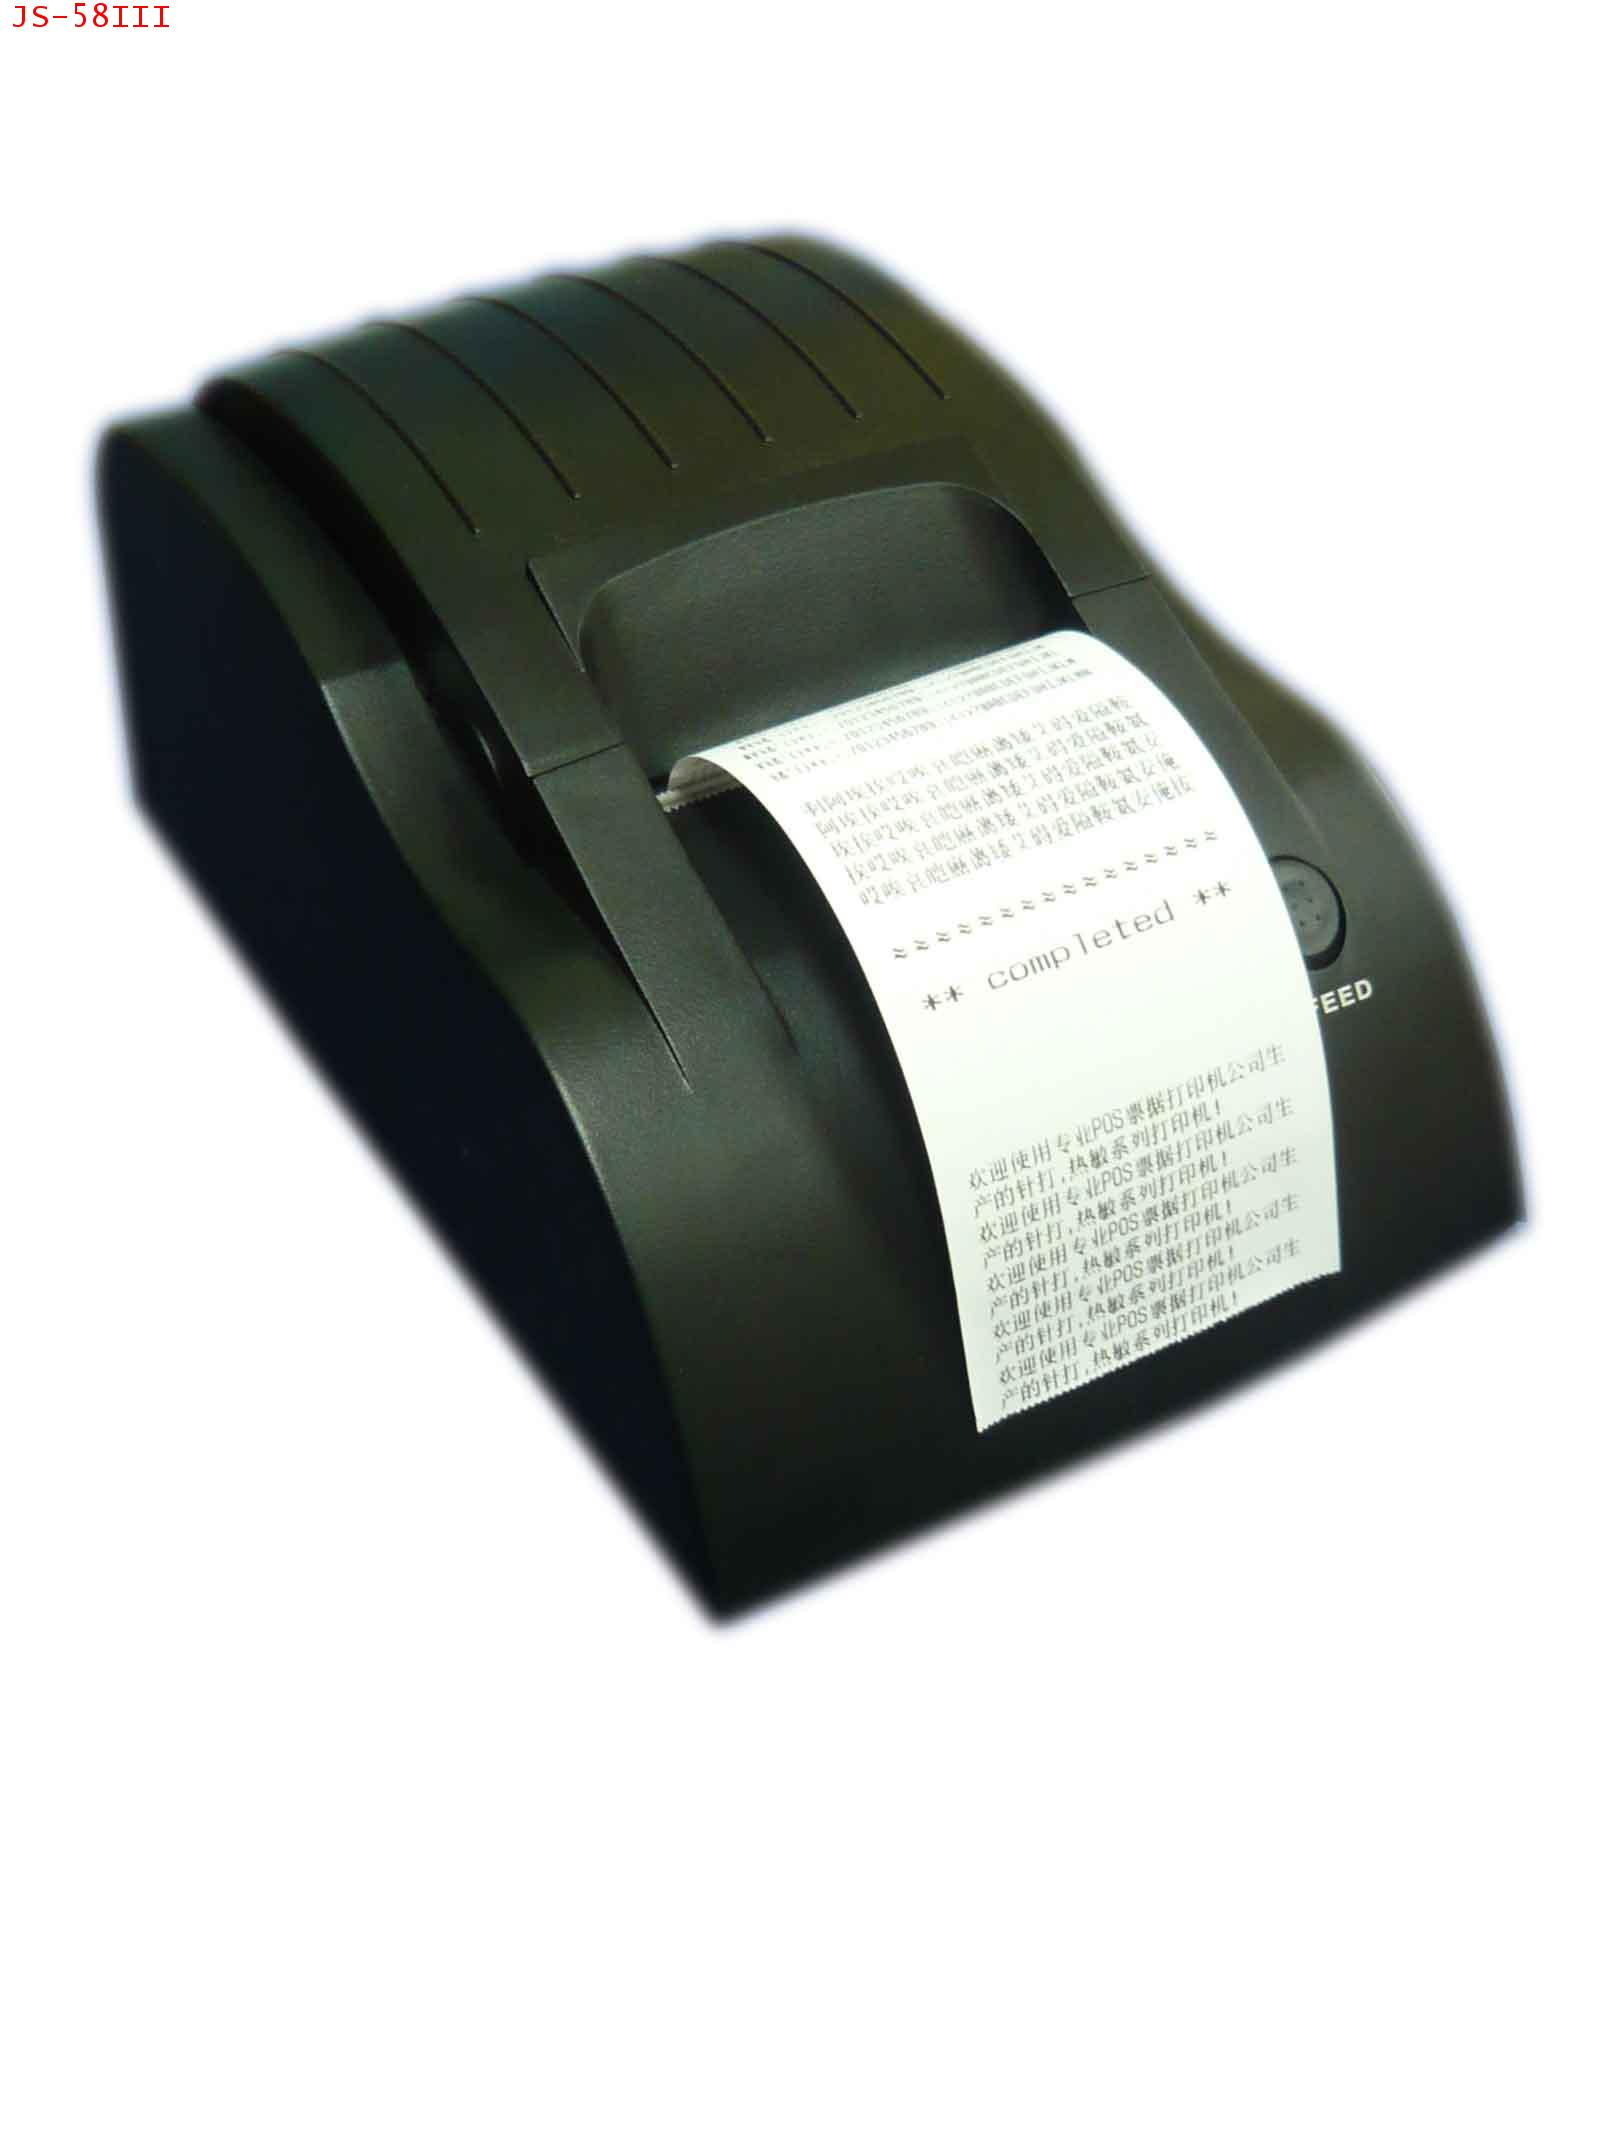 Thermal receipt printer JS-58III